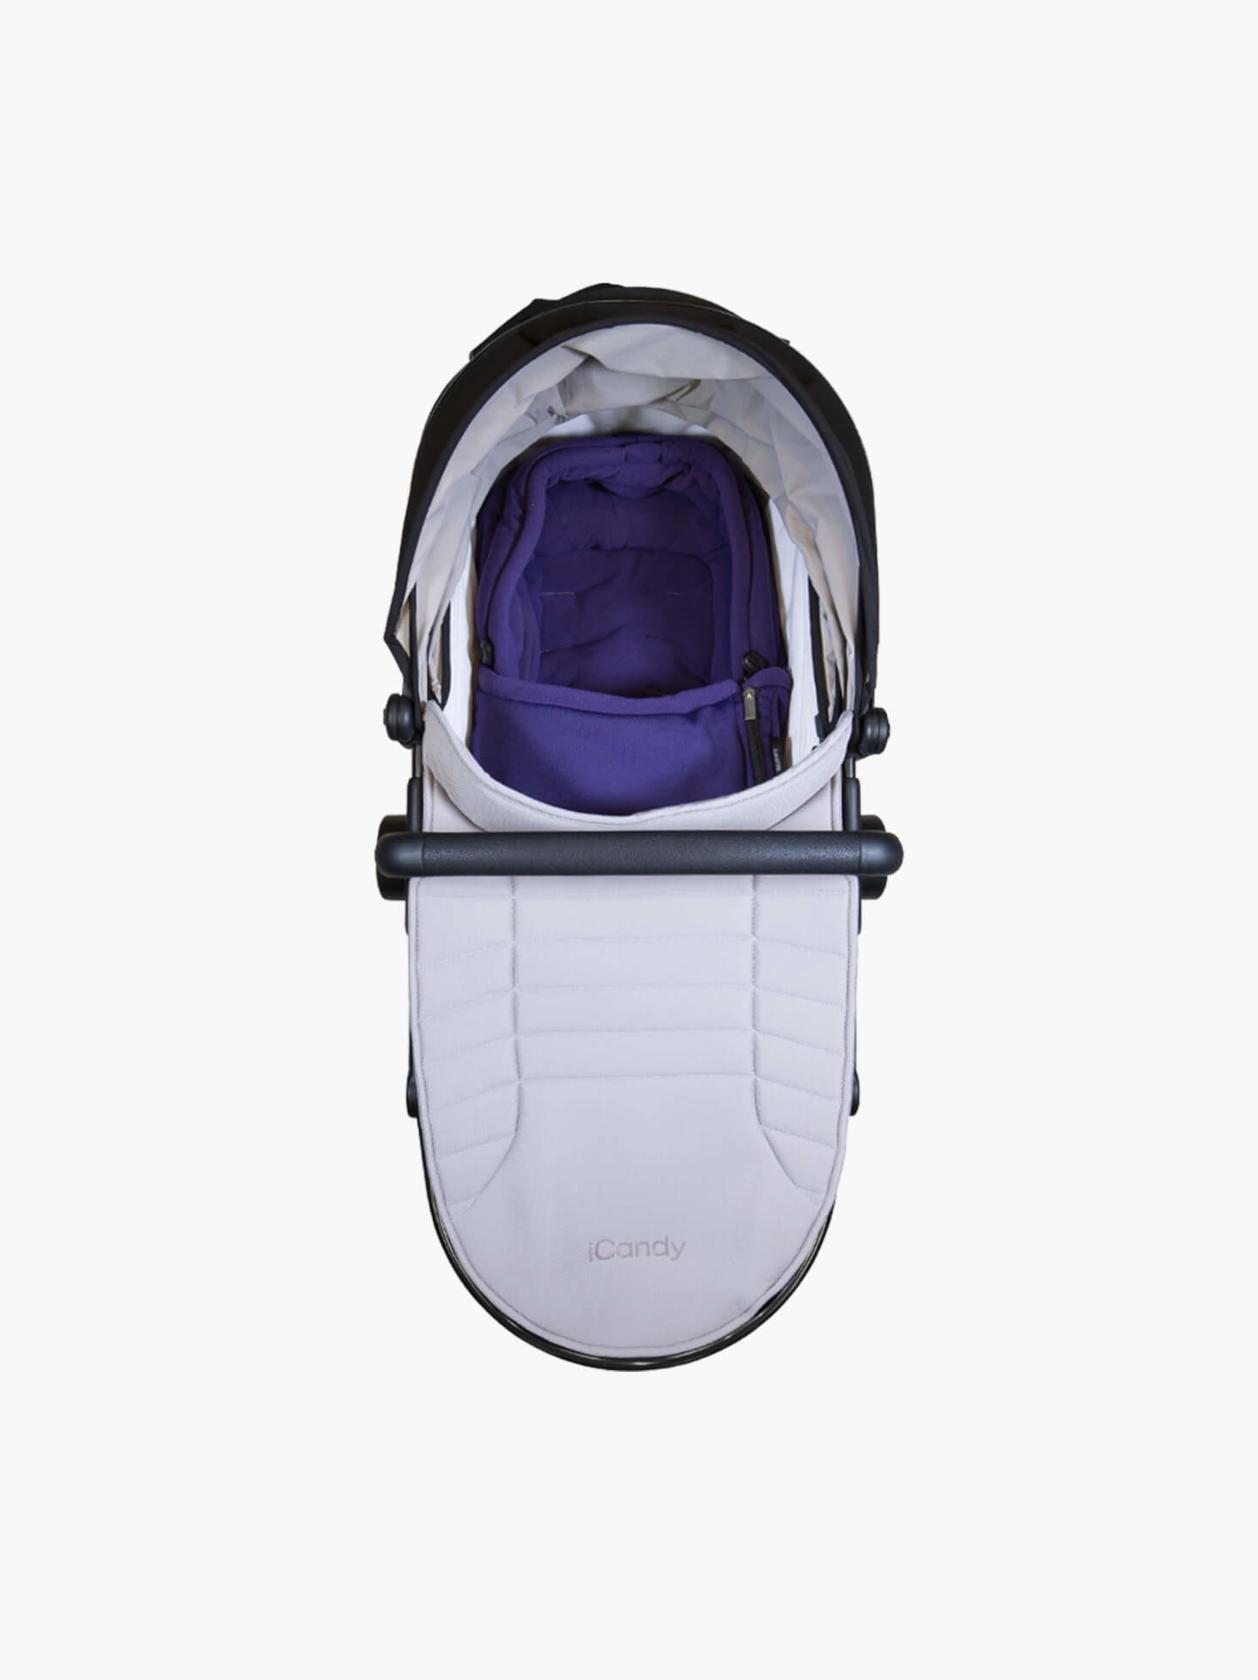 Newborn Pod for iCandy Peach Main Carrycot - Wisteria